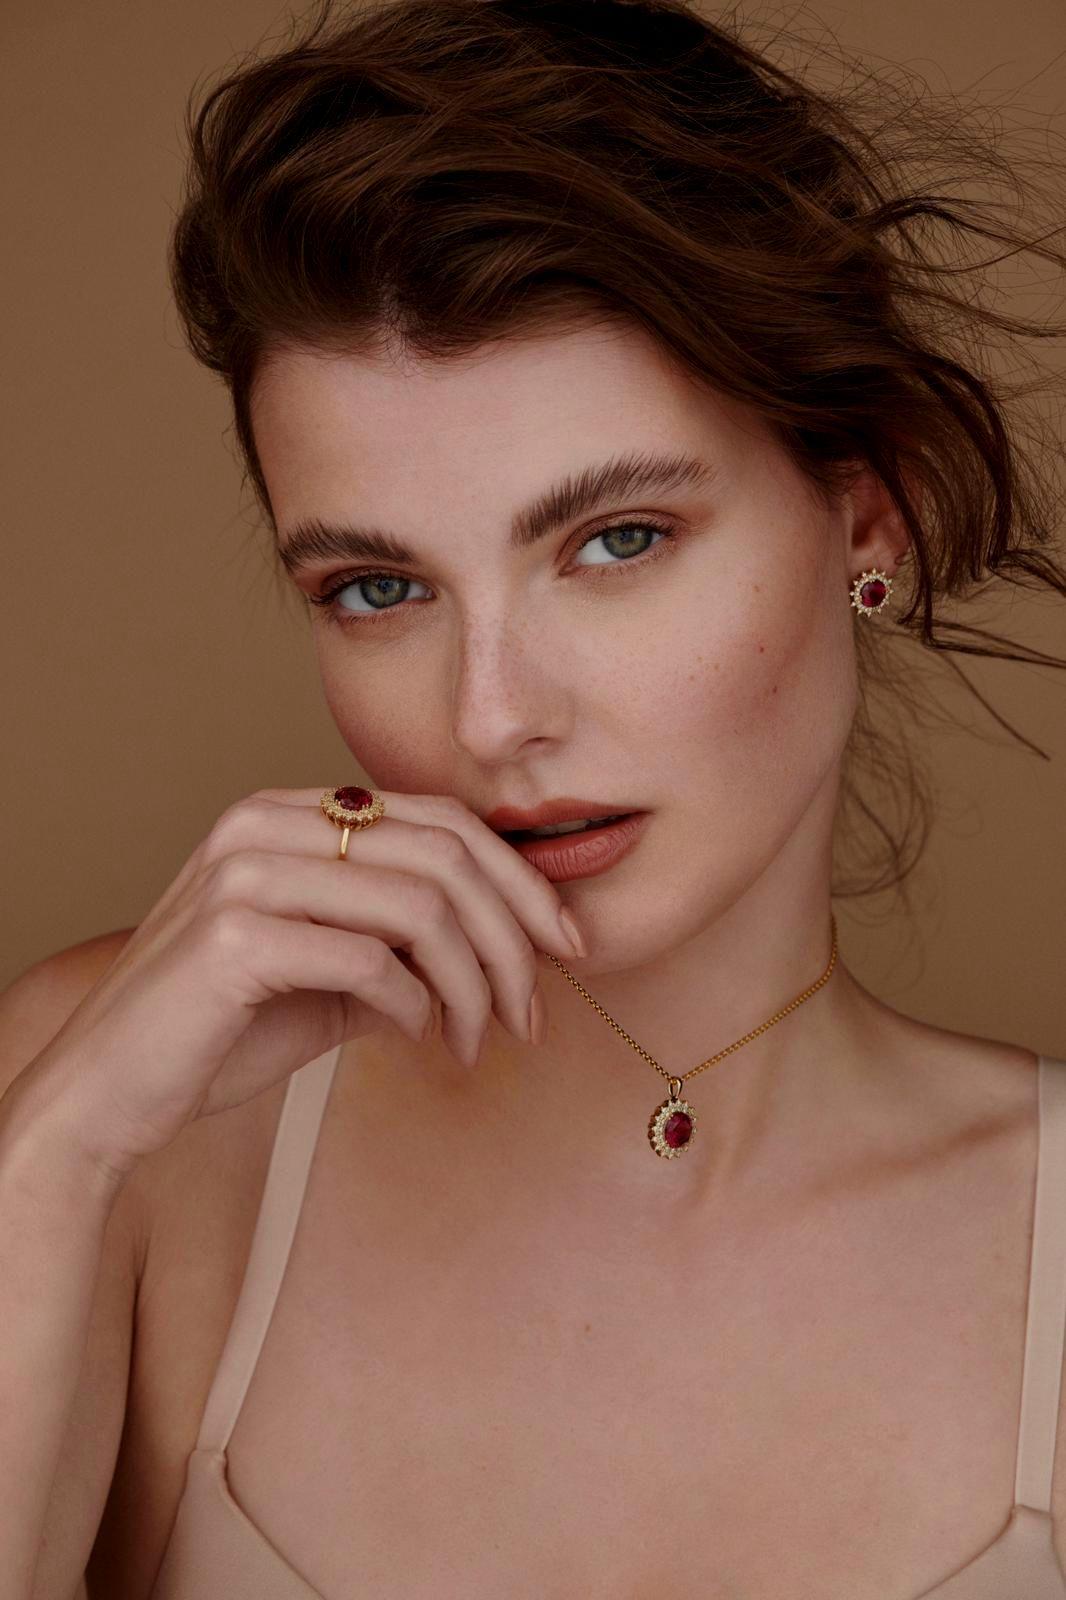 Juwelier Dietze,Inh. Bianca Sekerdick